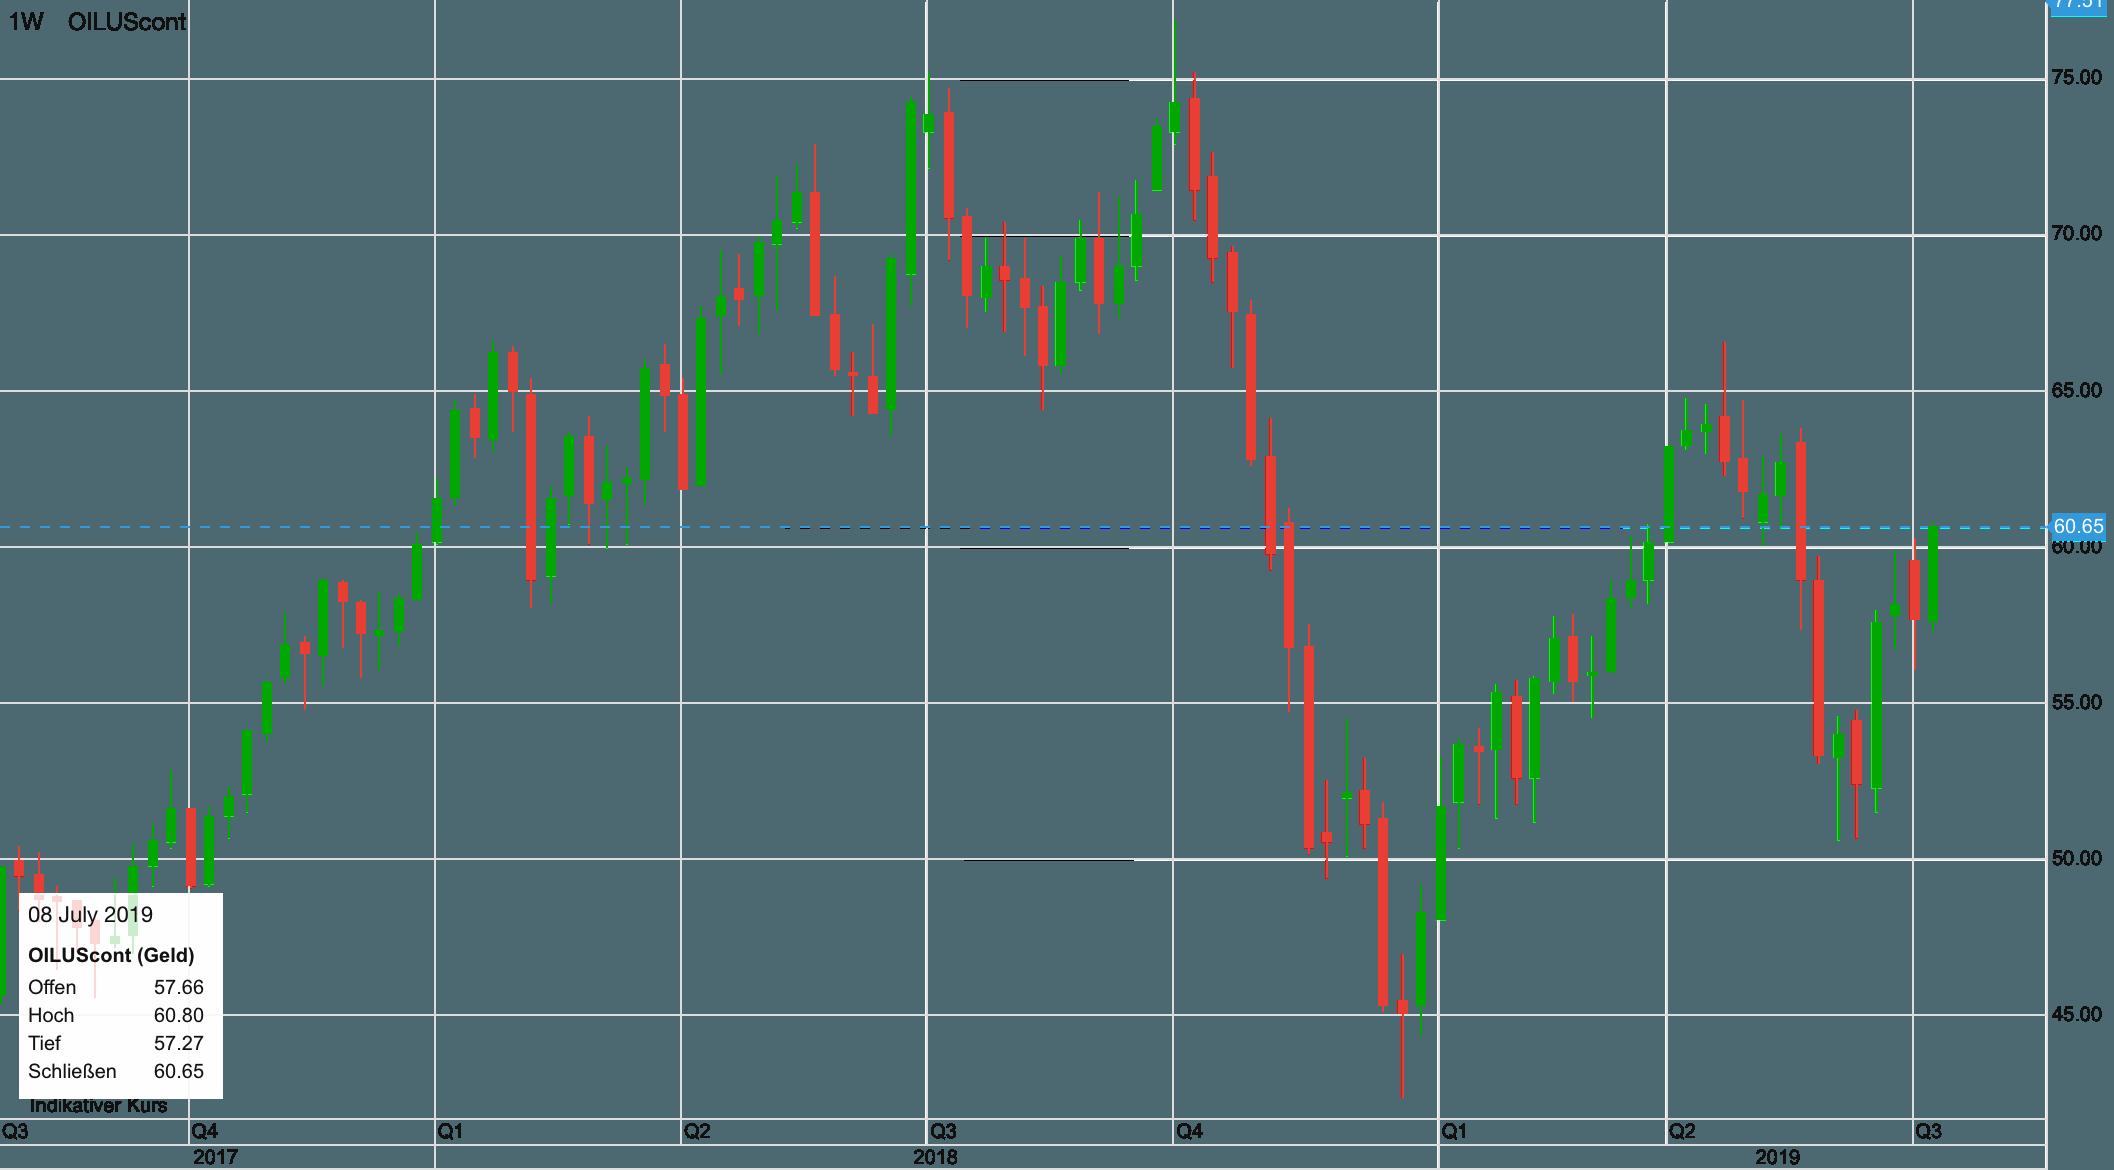 Ölpreis WTI seit 2017